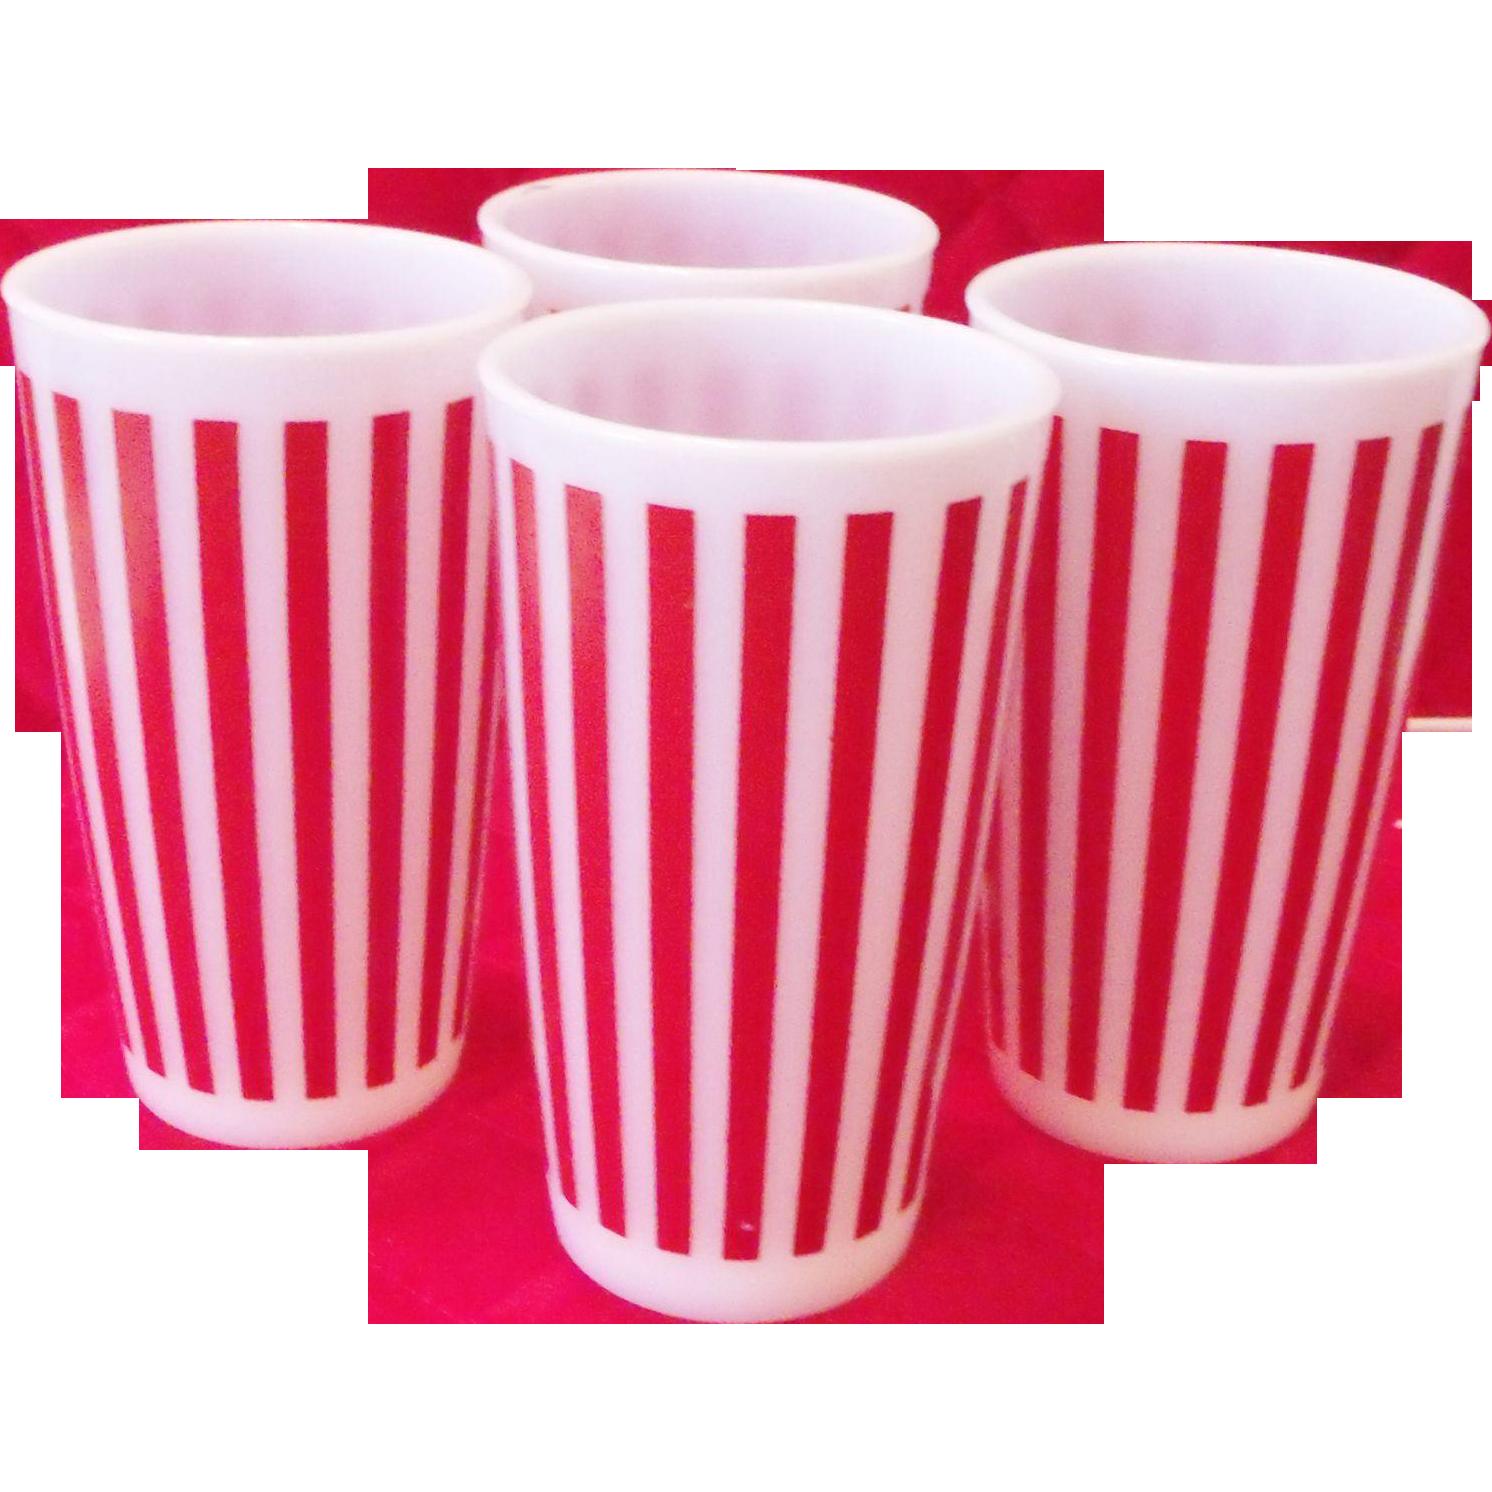 4 Vintage Red & White Candy Stripe Milk Glass Tumbler Retro Hazel AtlasGlasses